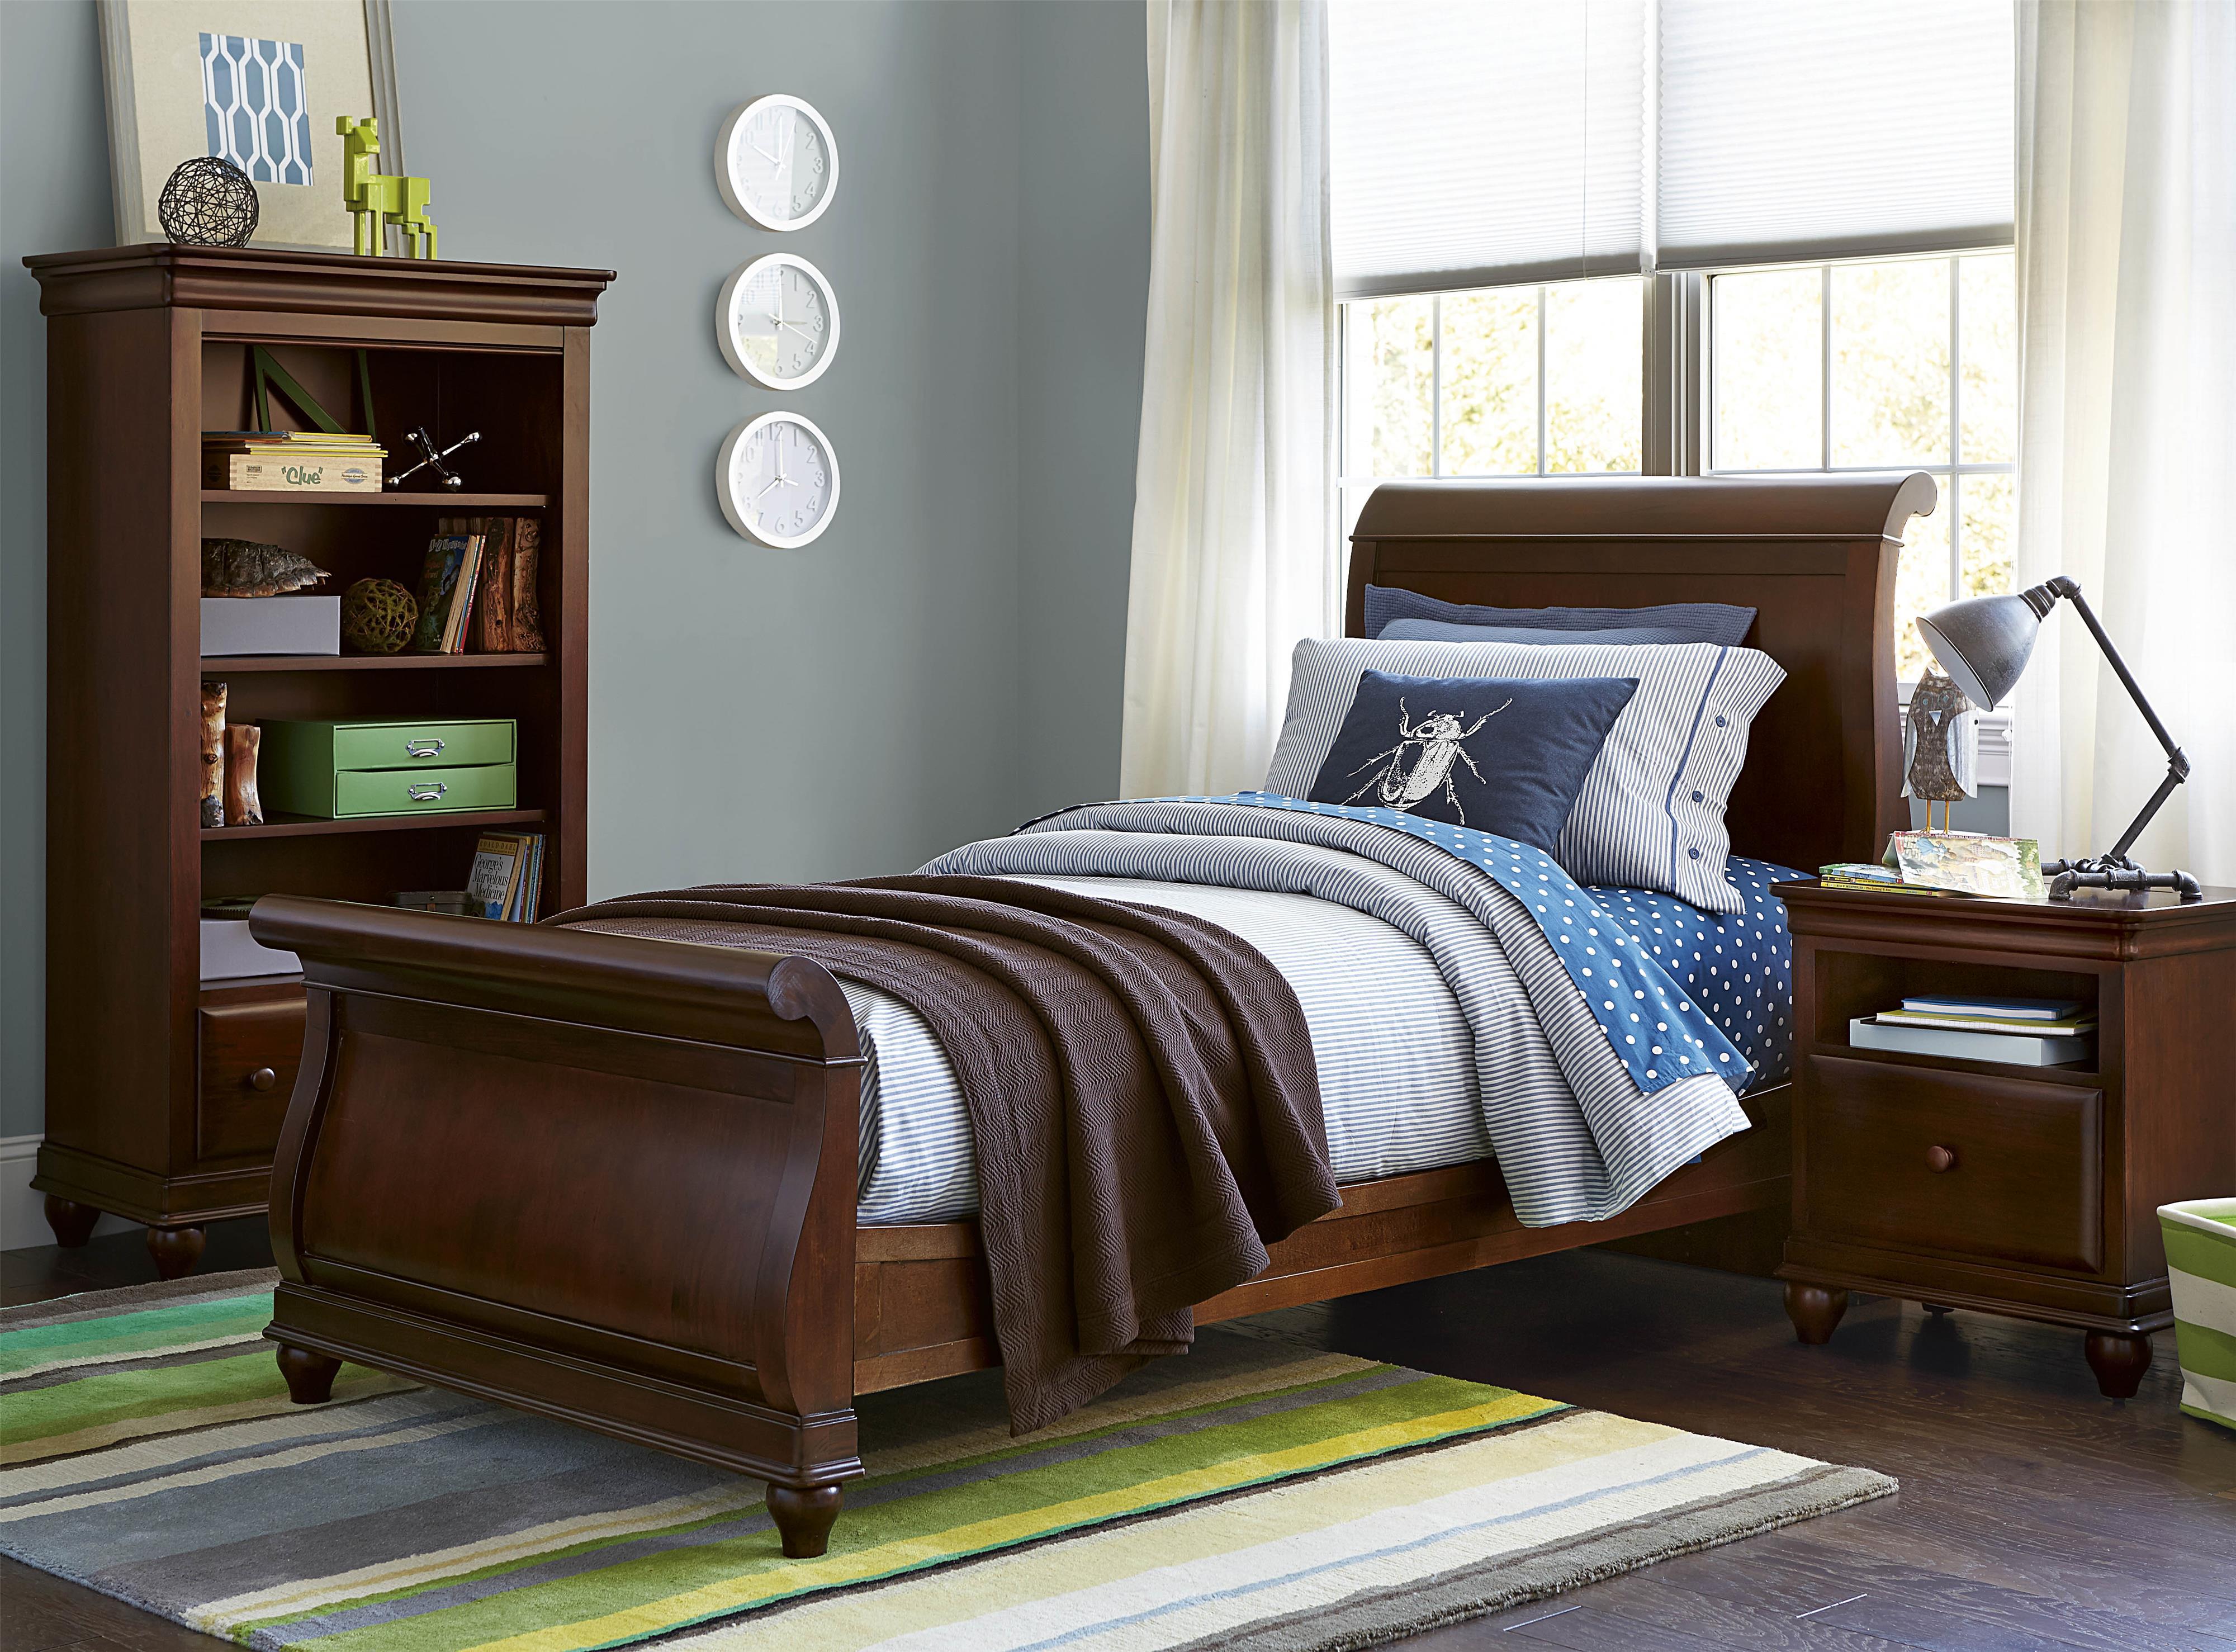 Smartstuff Classics 4.0 Full Bedroom Group - Item Number: 1312 F Bedroom Group 3